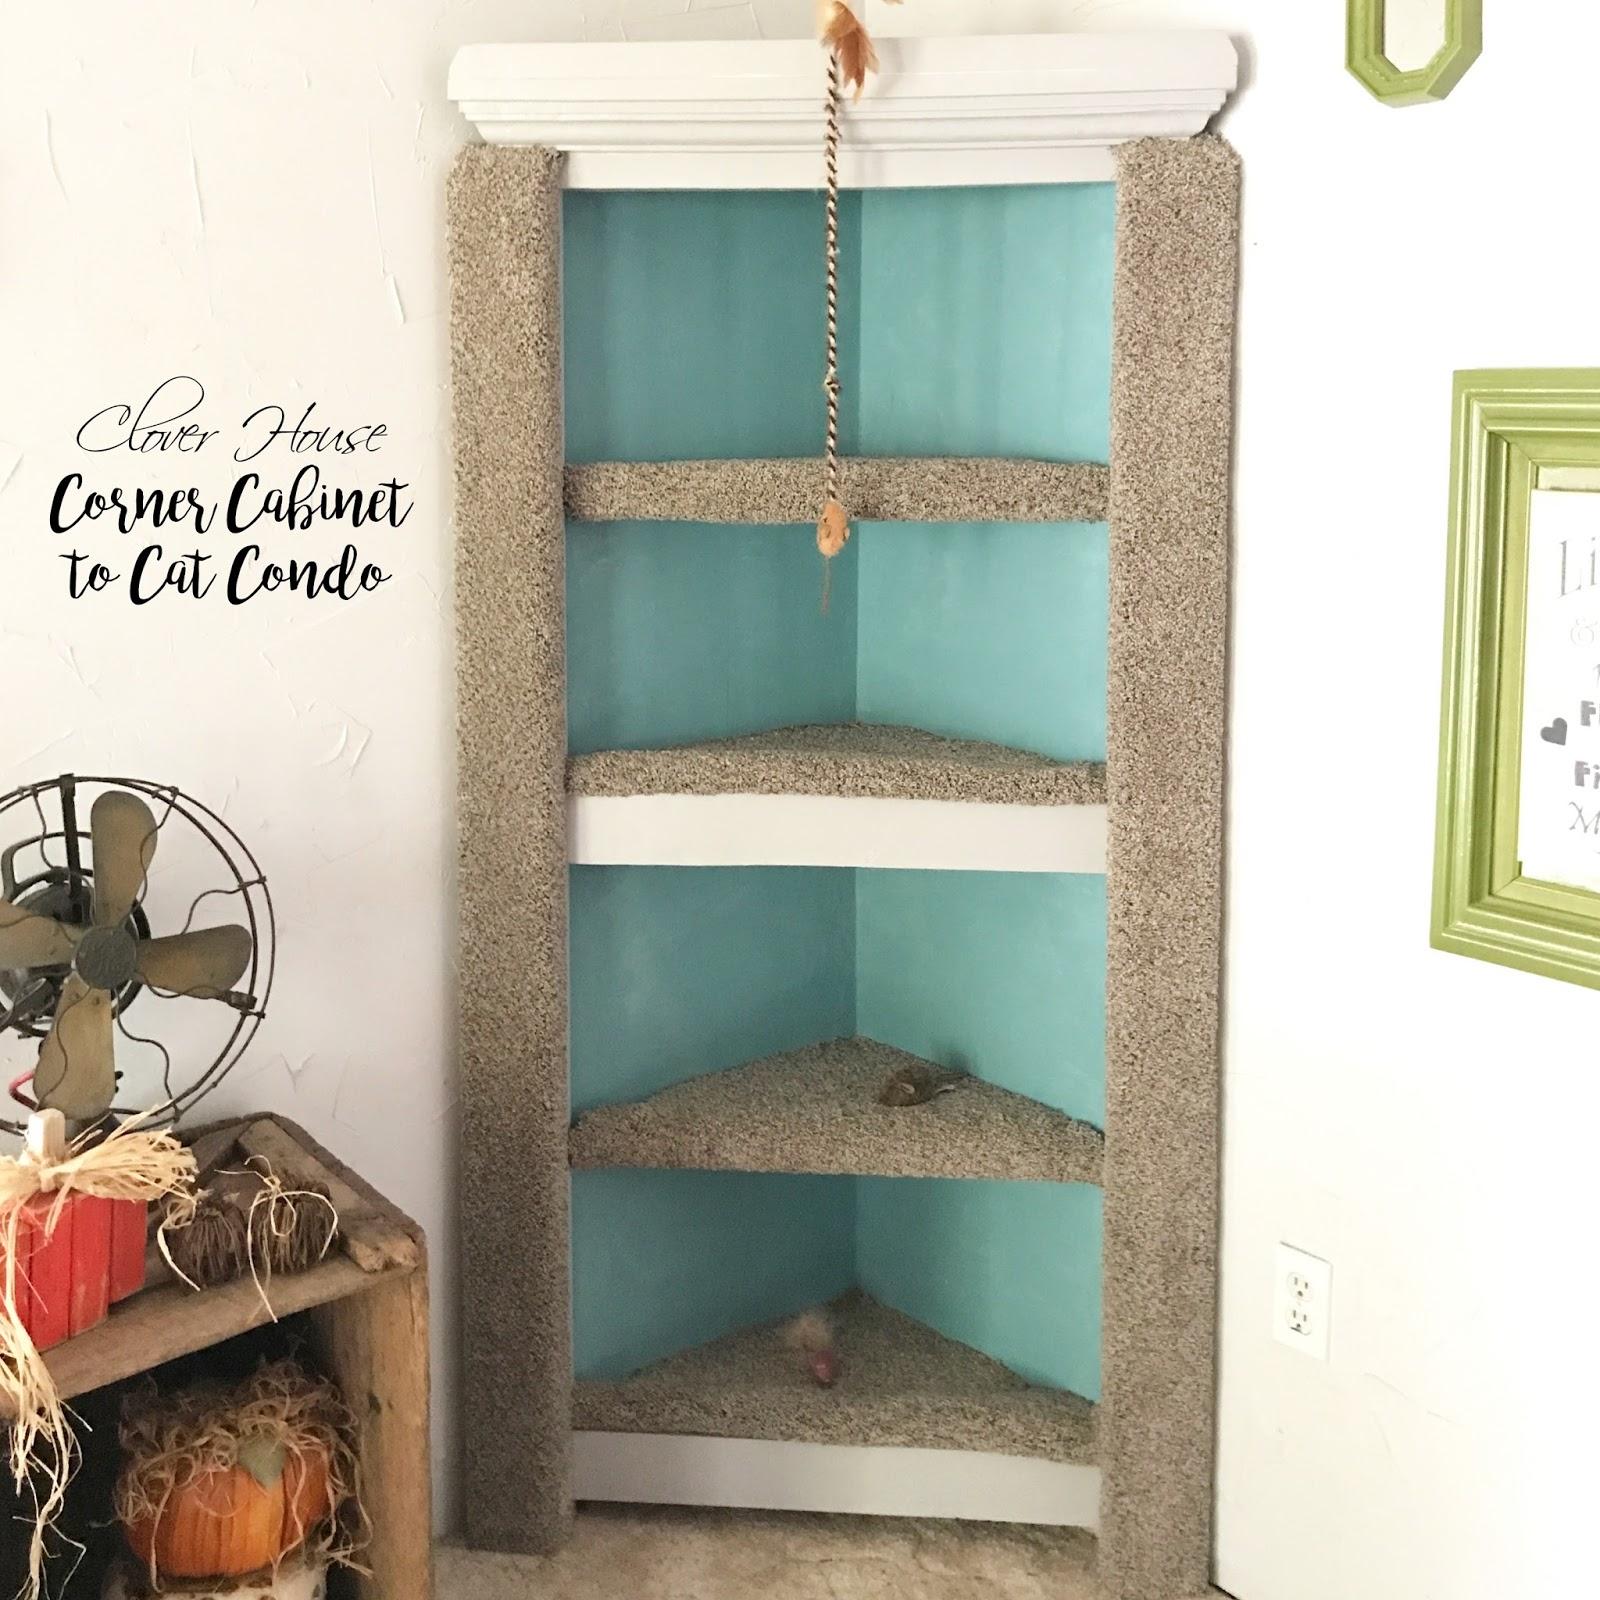 Clover House: Corner Cabinet to Cat Condo